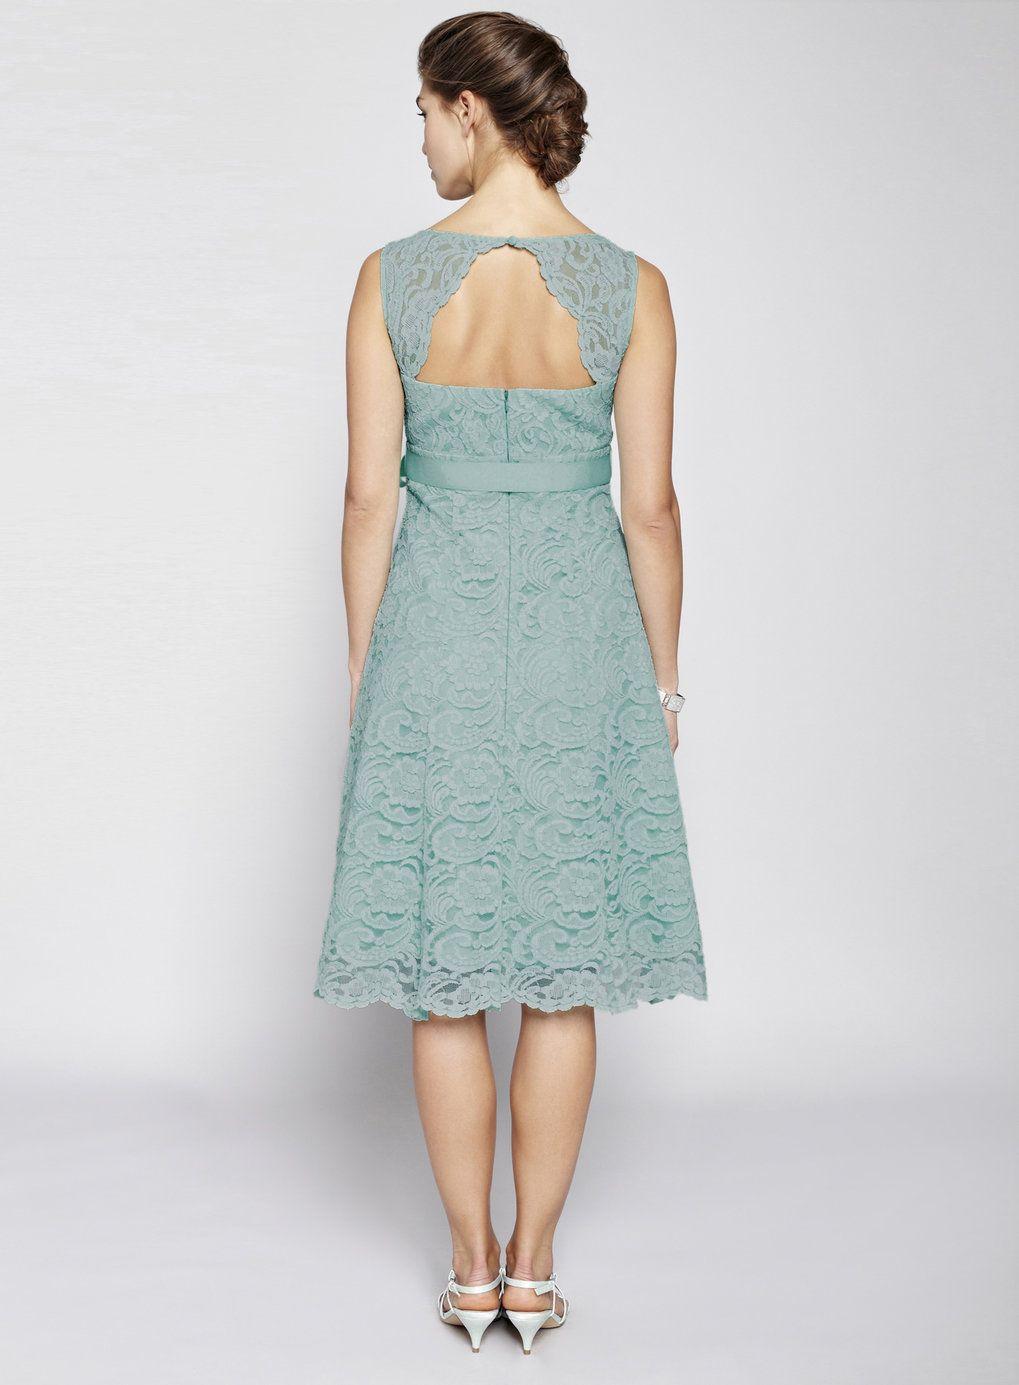 Dark Mint Bella Lace Short Bridesmaid Dress - BHS | bridesmaid ...